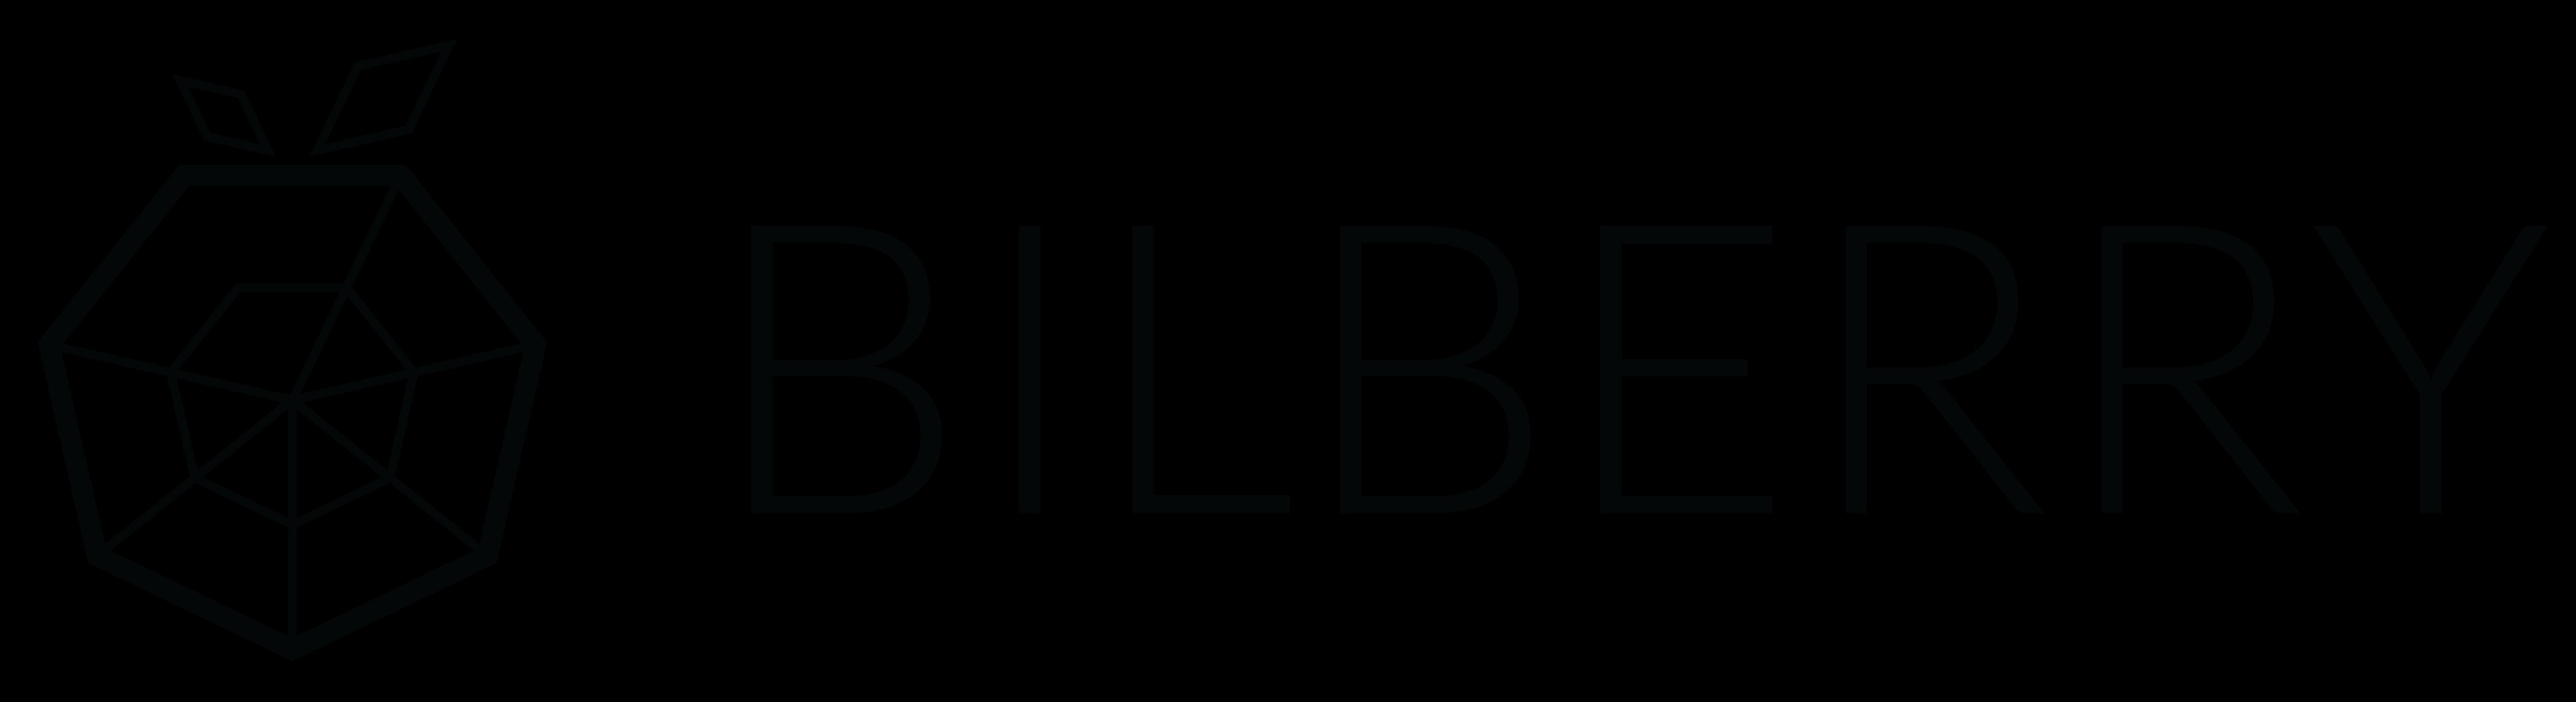 Bilberry